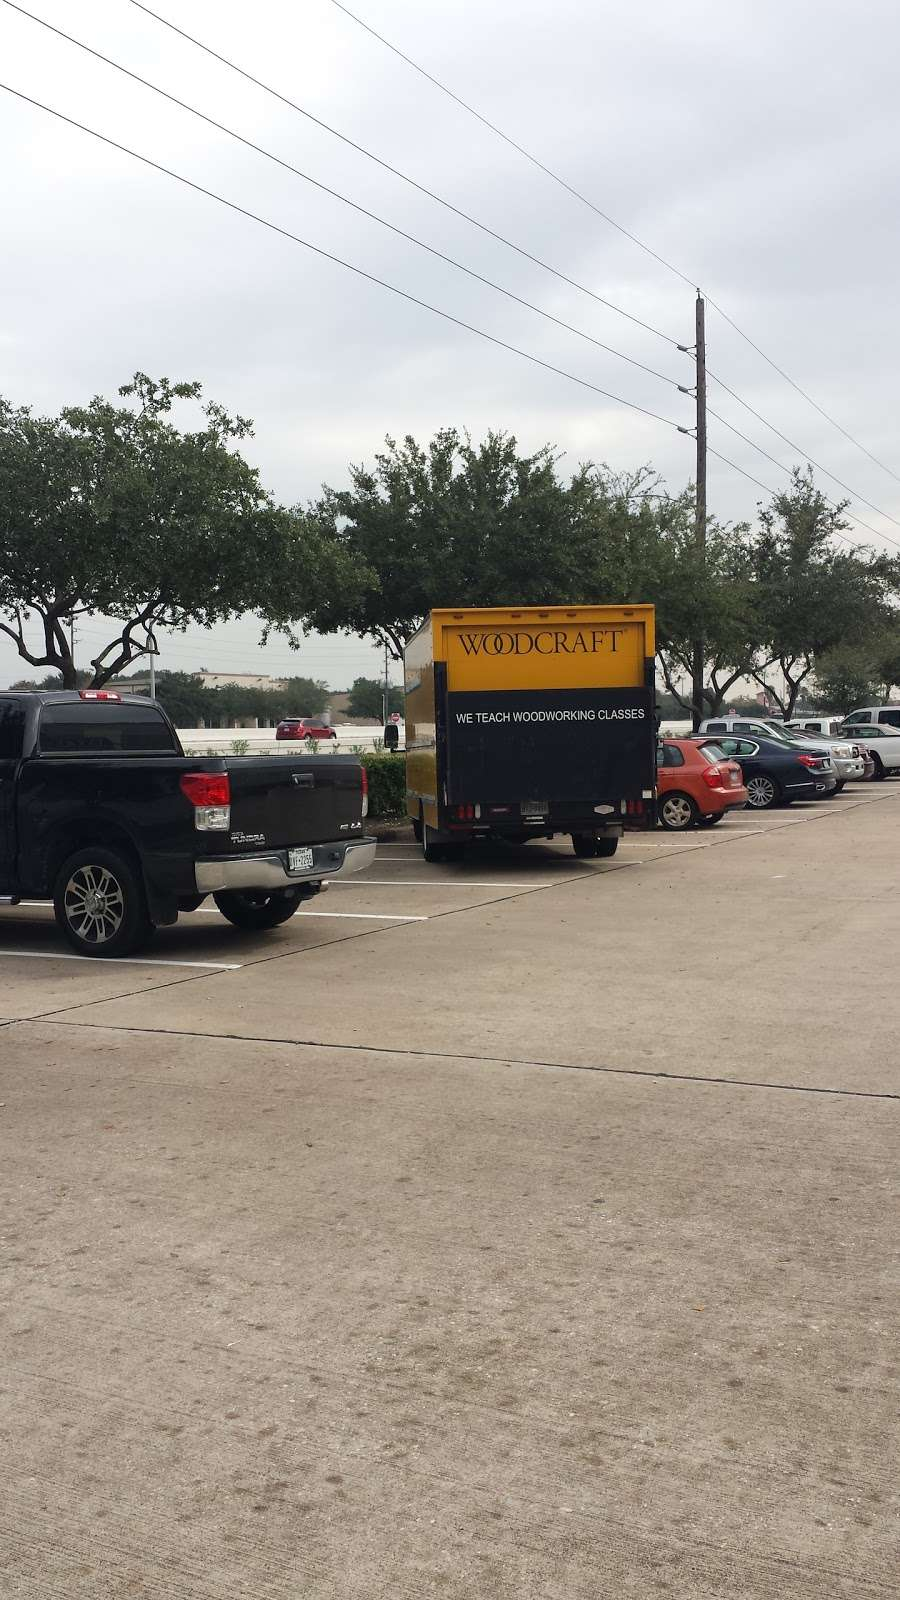 Woodcraft Of Houston Southwest Store 11707 S Sam Houston Pkwy W Houston Tx 77031 Usa